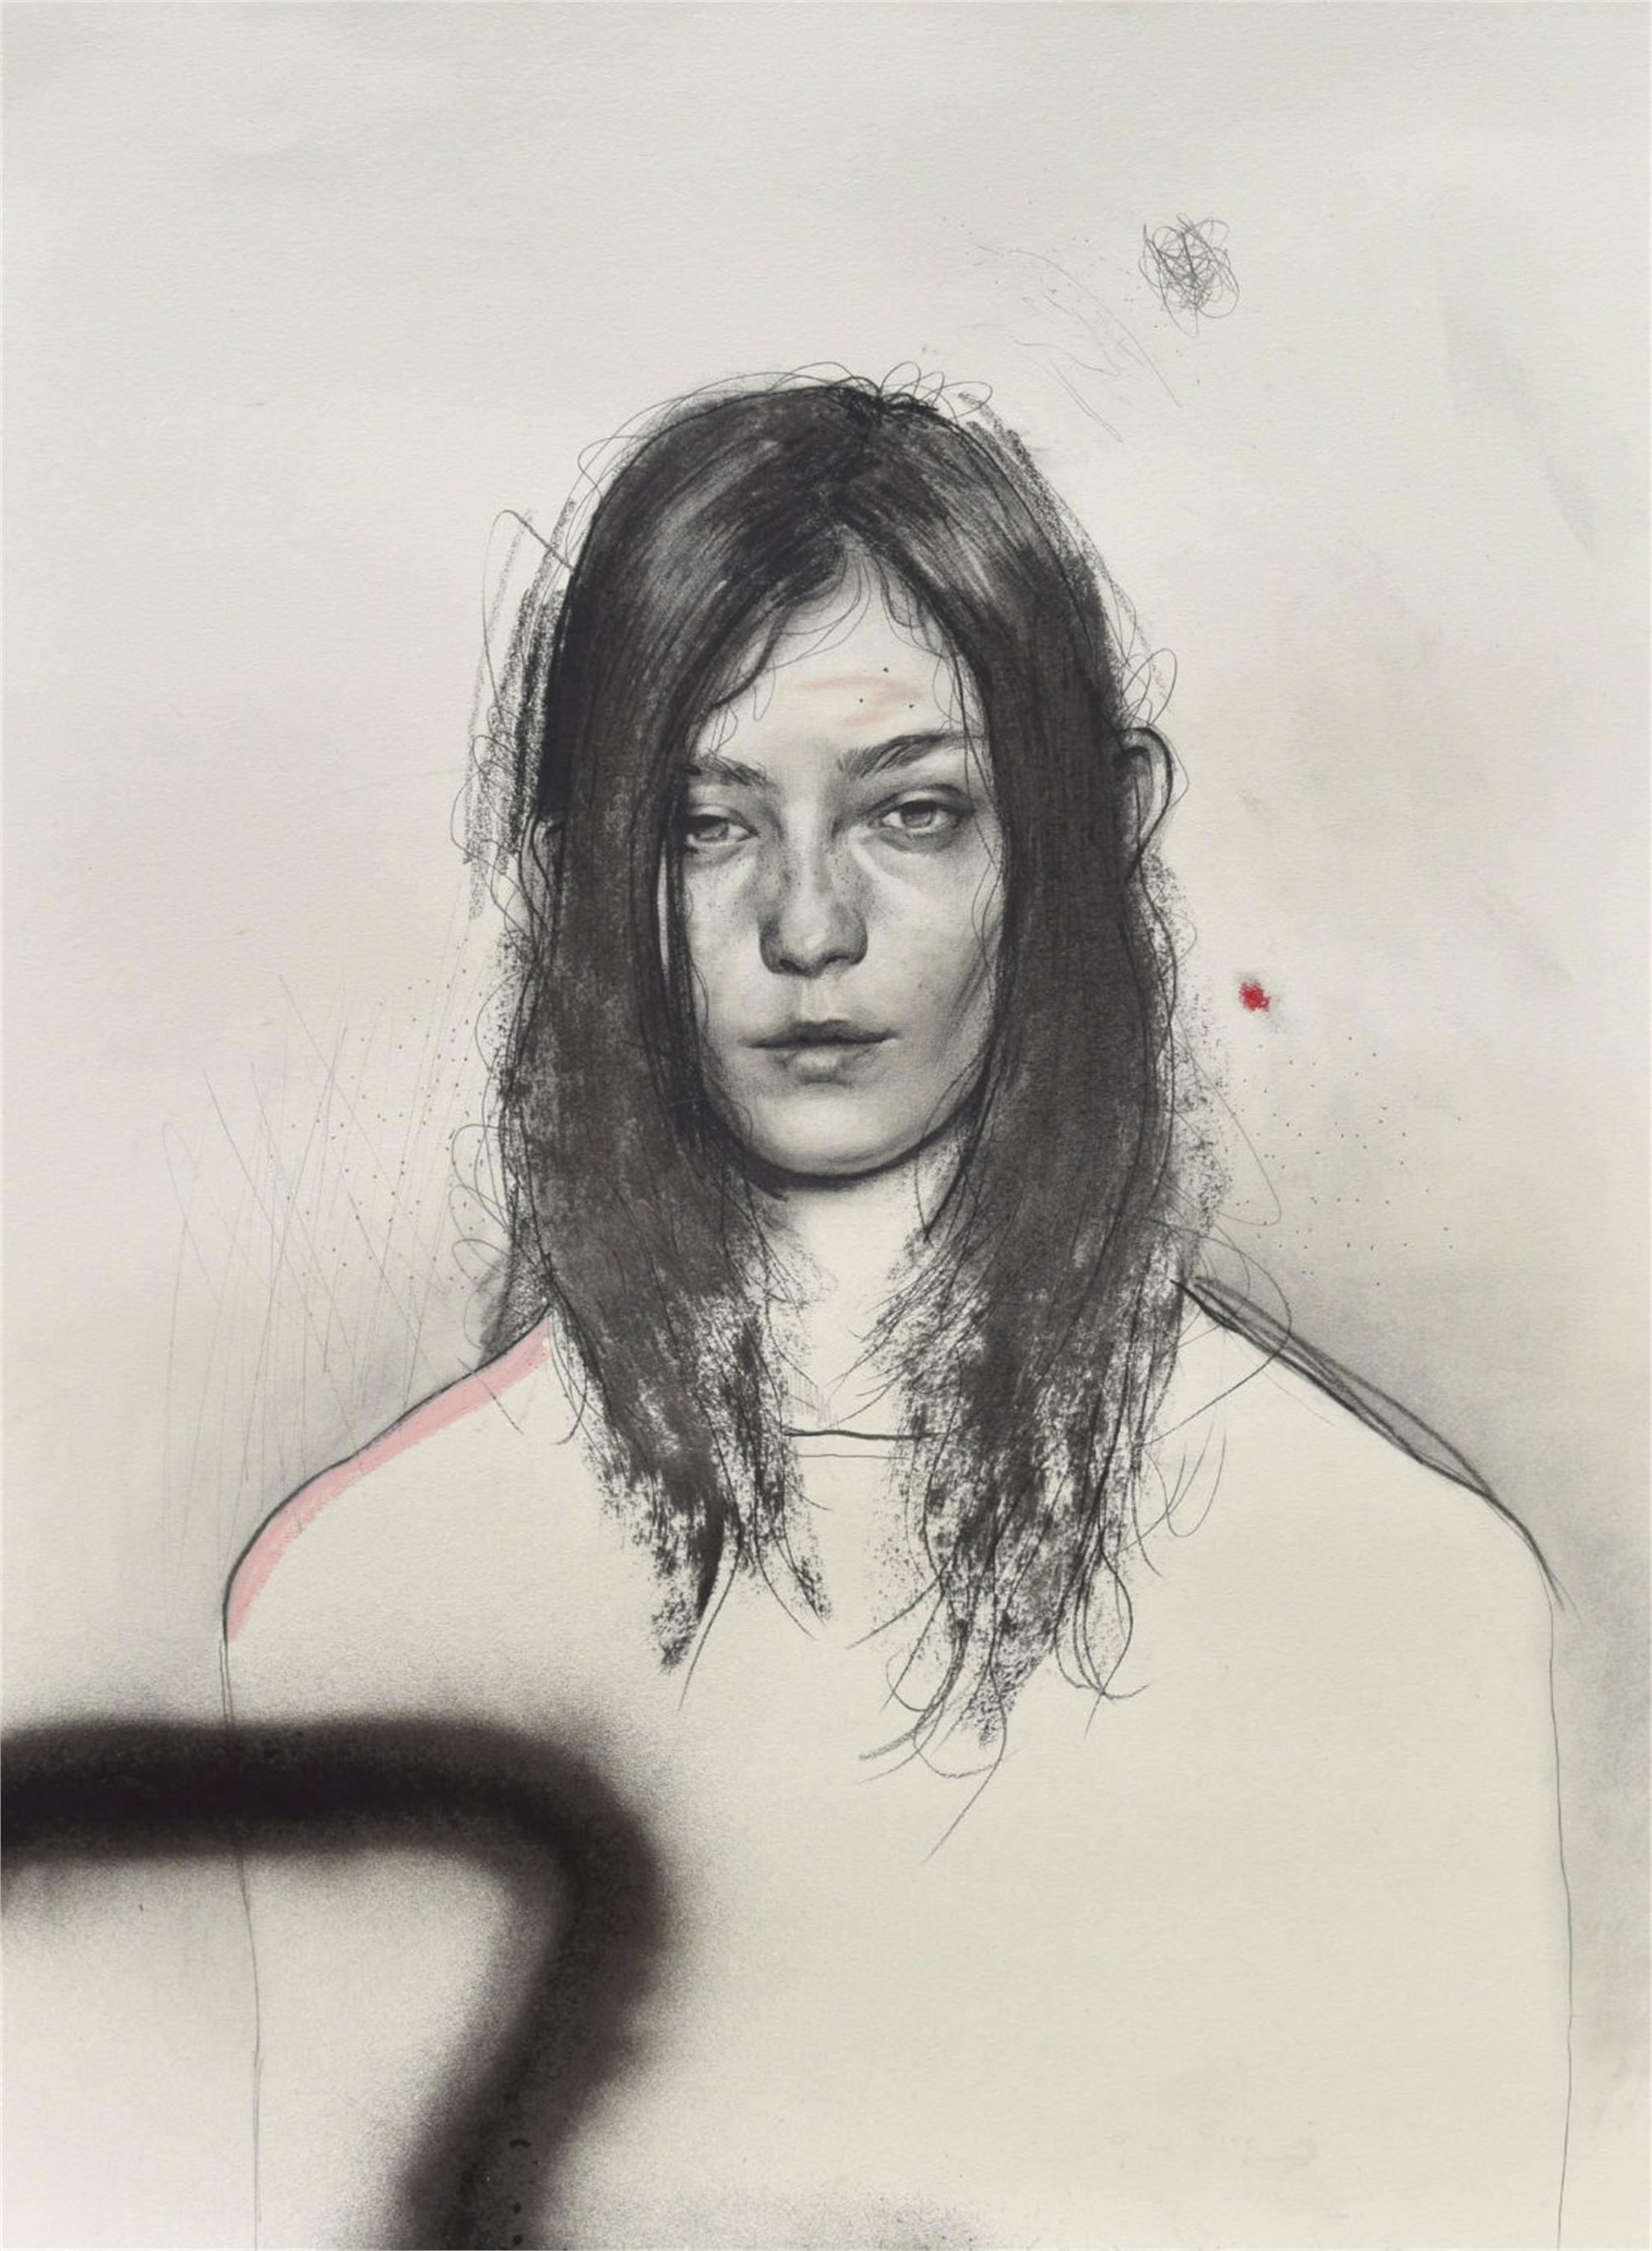 Psyche by Daniel Segrove